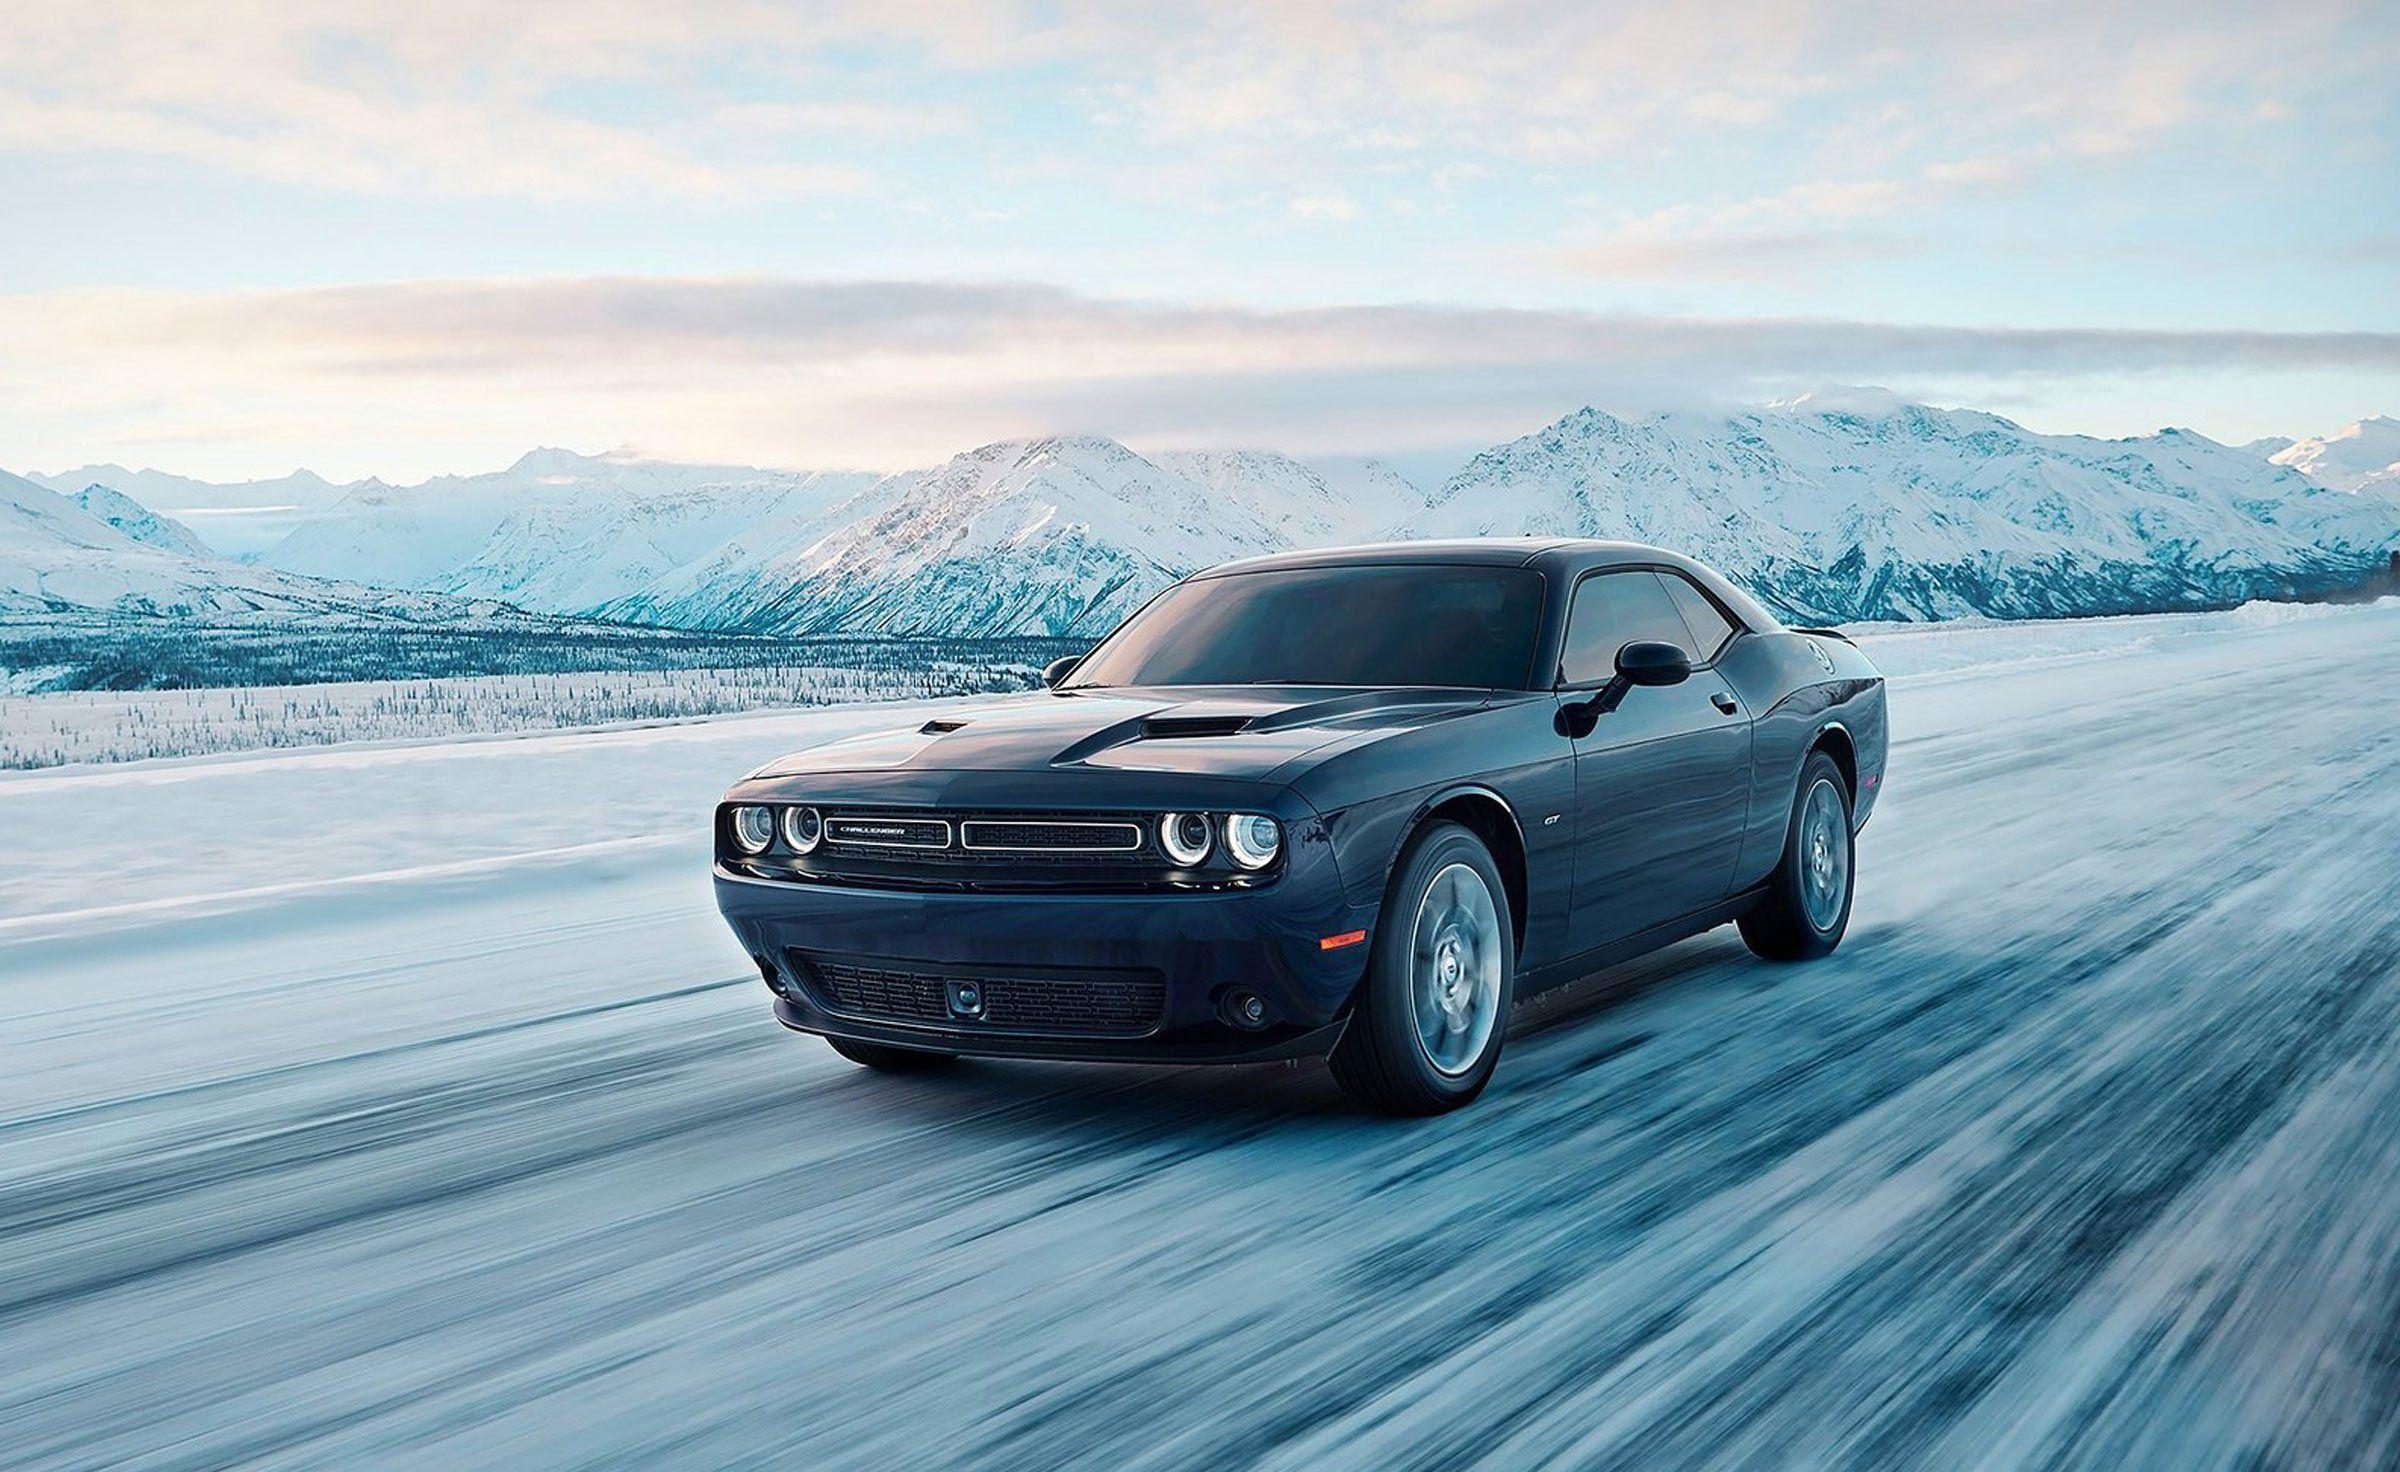 2017 Dodge Challenger Gt Awd Dodge Challenger Gt Dodge Challenger 2018 Dodge Challenger